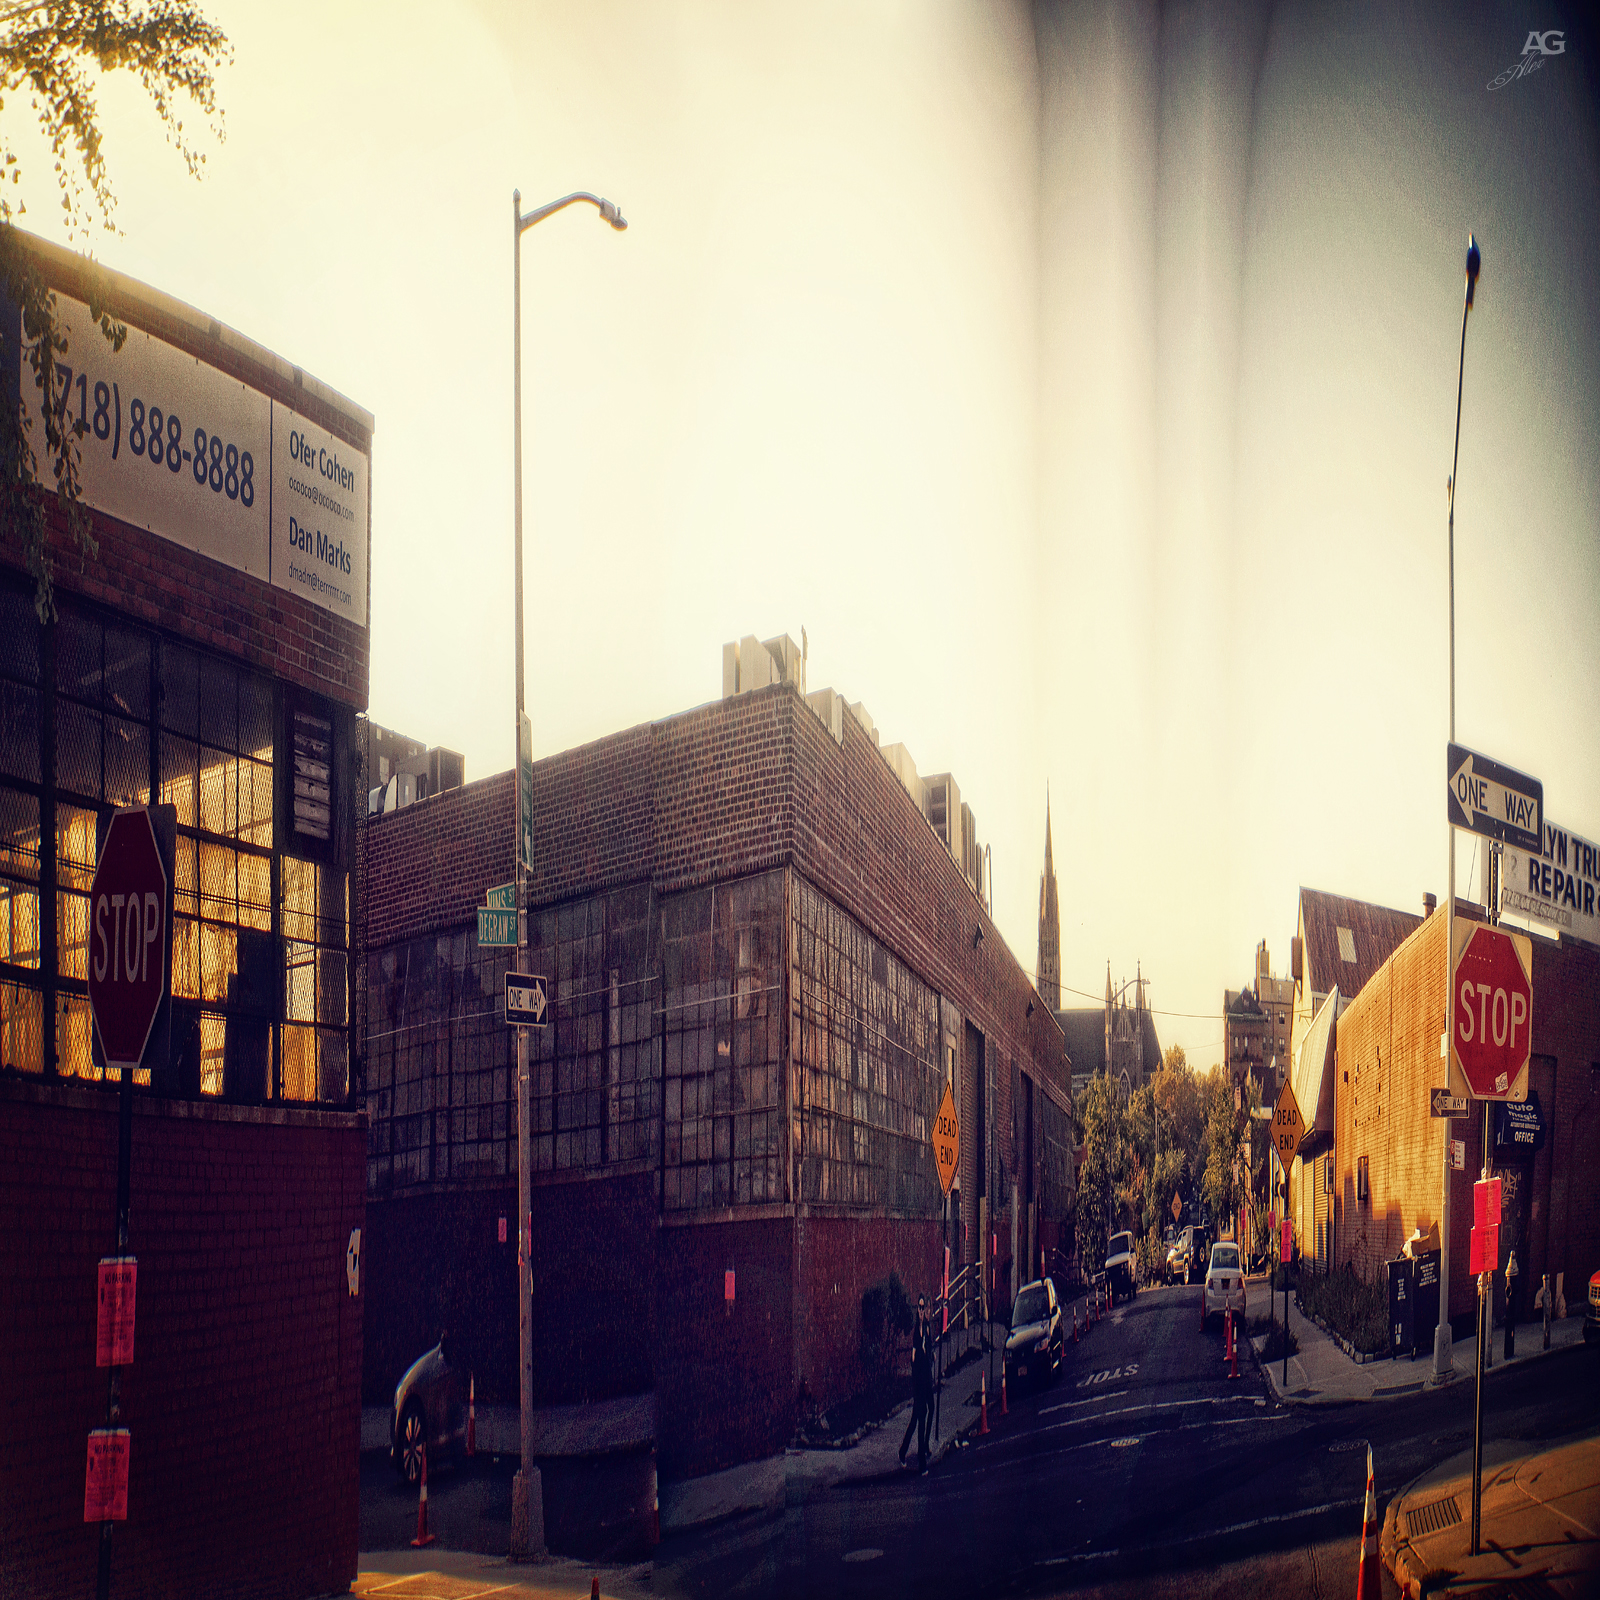 Ungroomed StreetInBrooklynDowntownNearGovanus-warped_1600